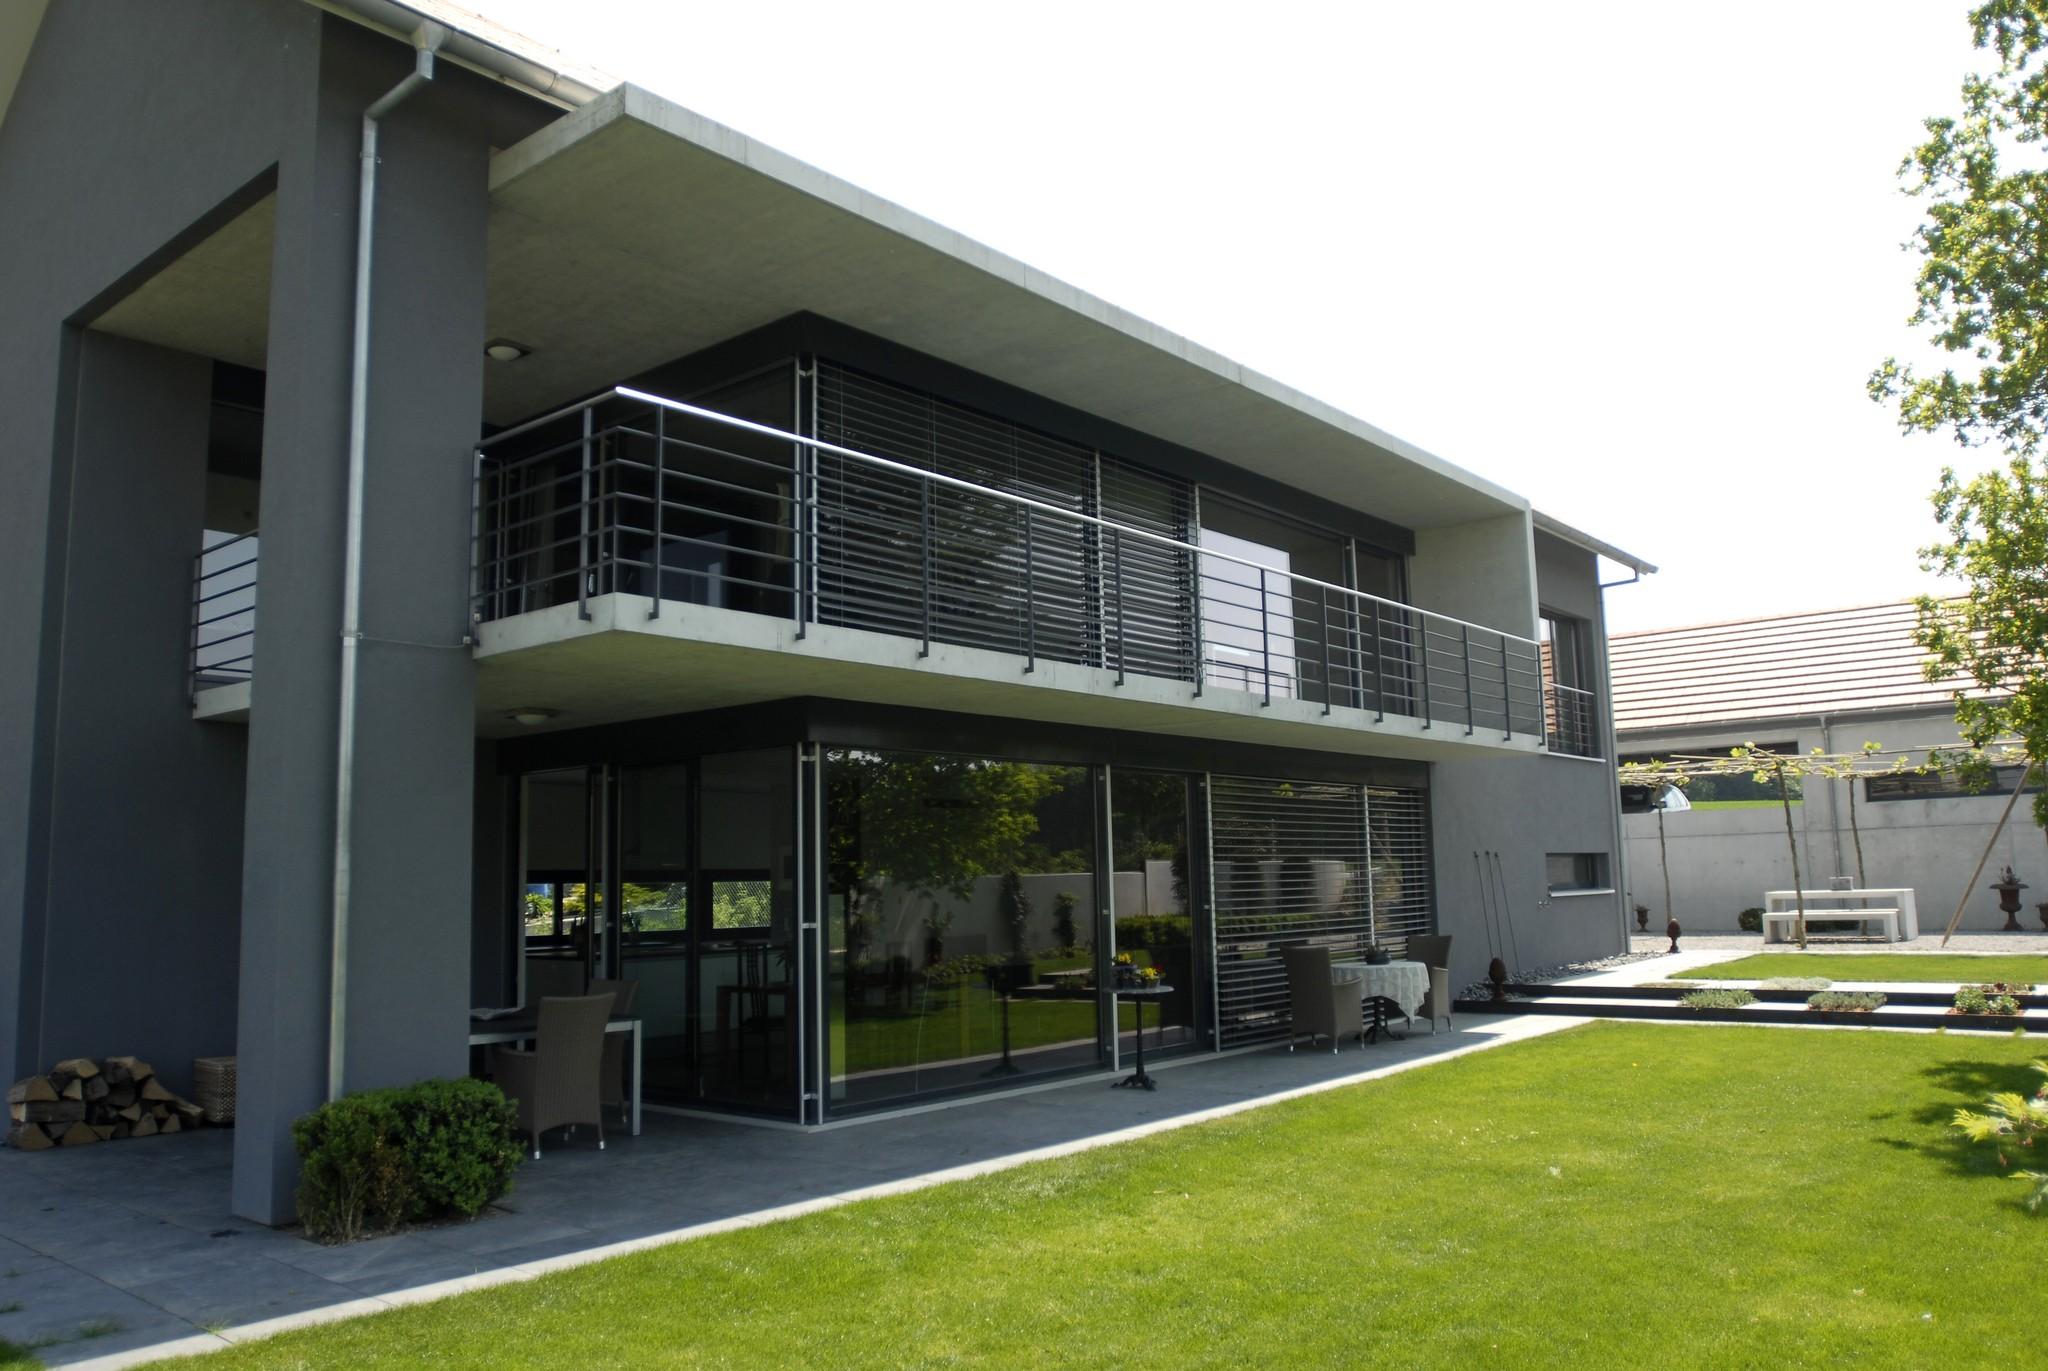 2005 Küttigkofen – Neubau Einfamilienhaus